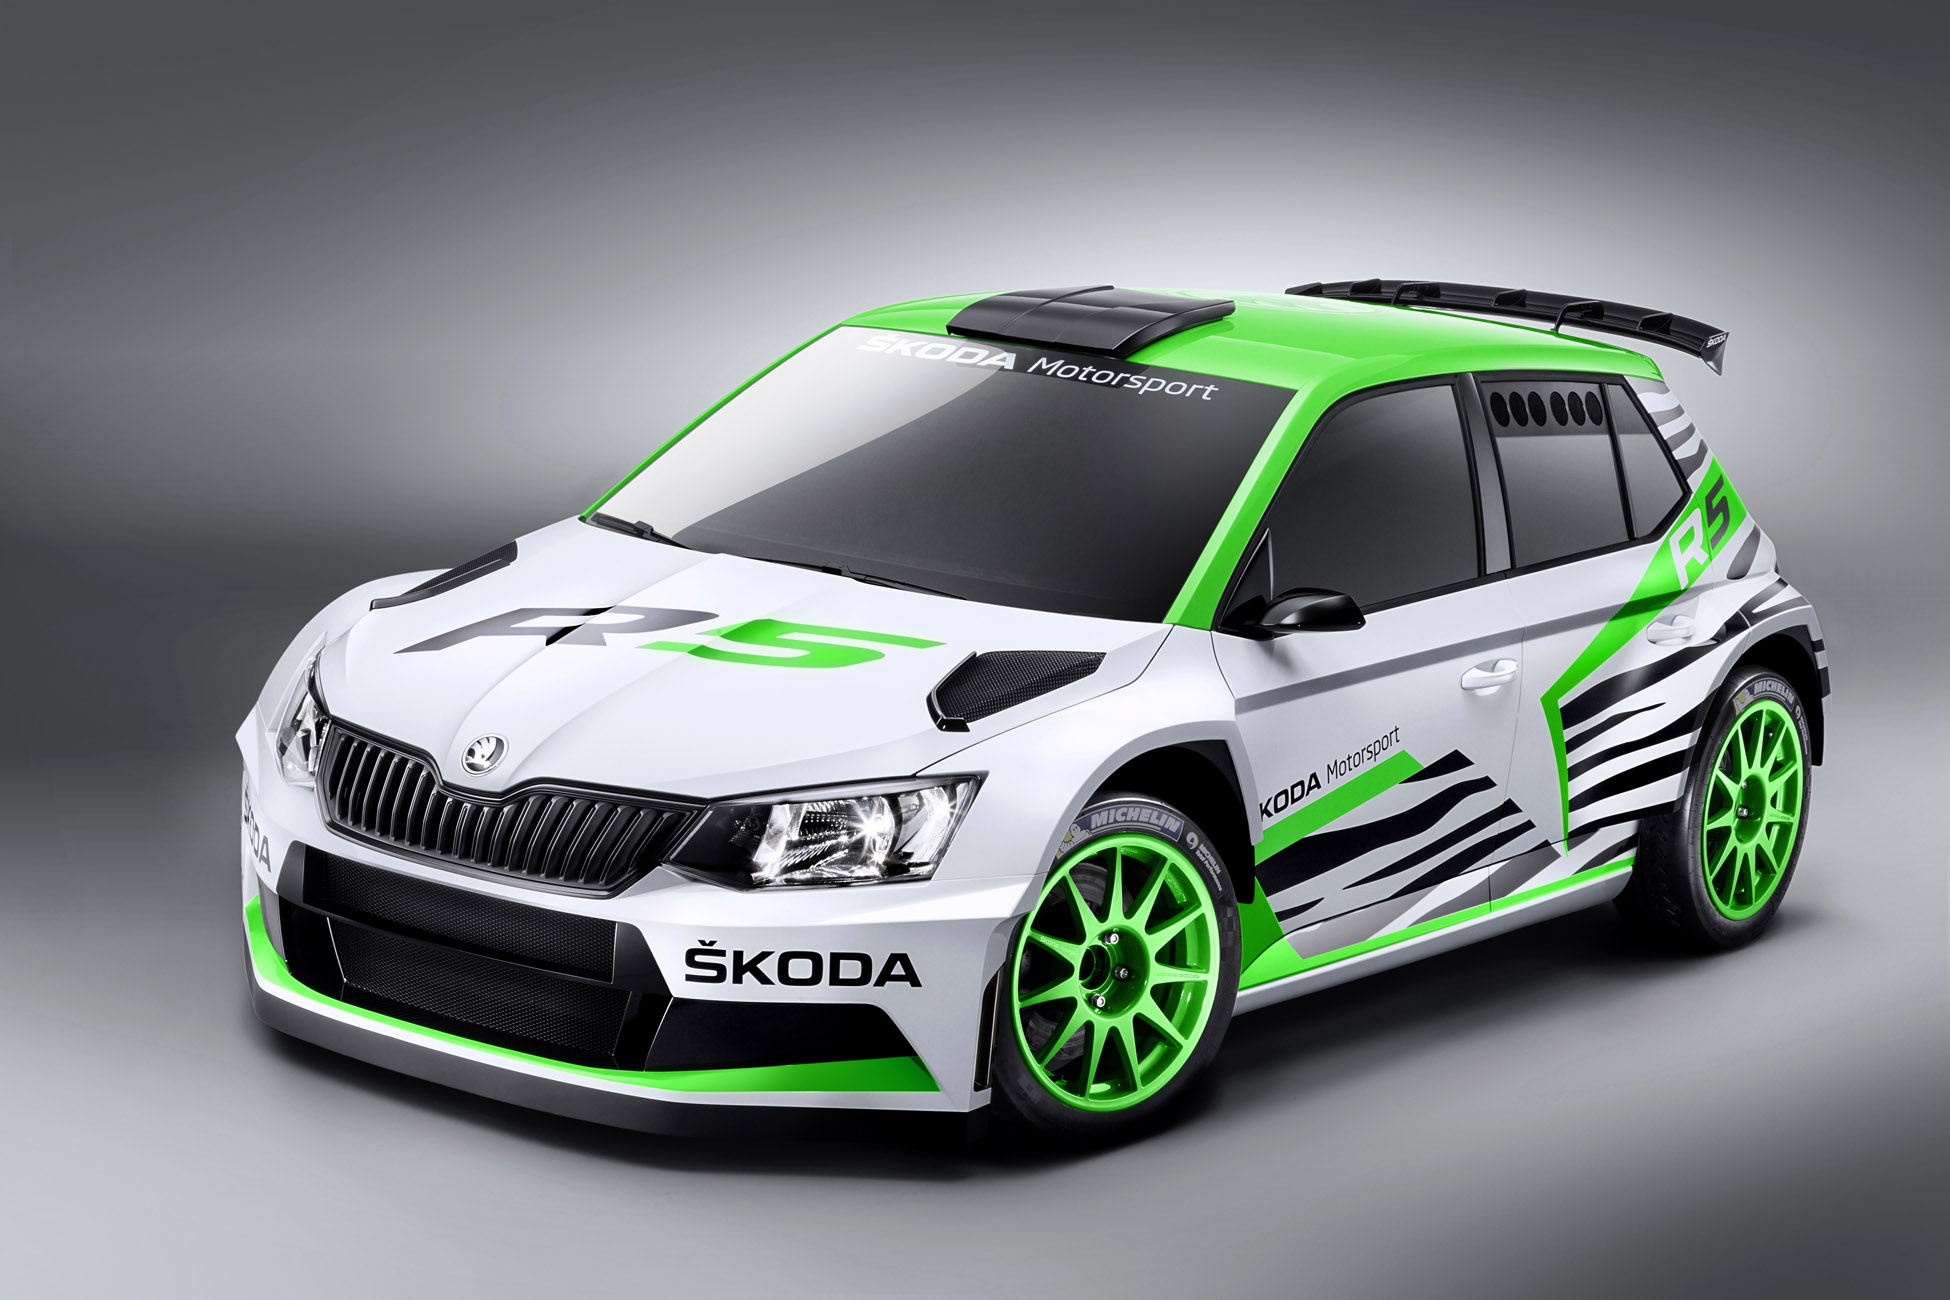 2015 Skoda Fabia R5 Concept